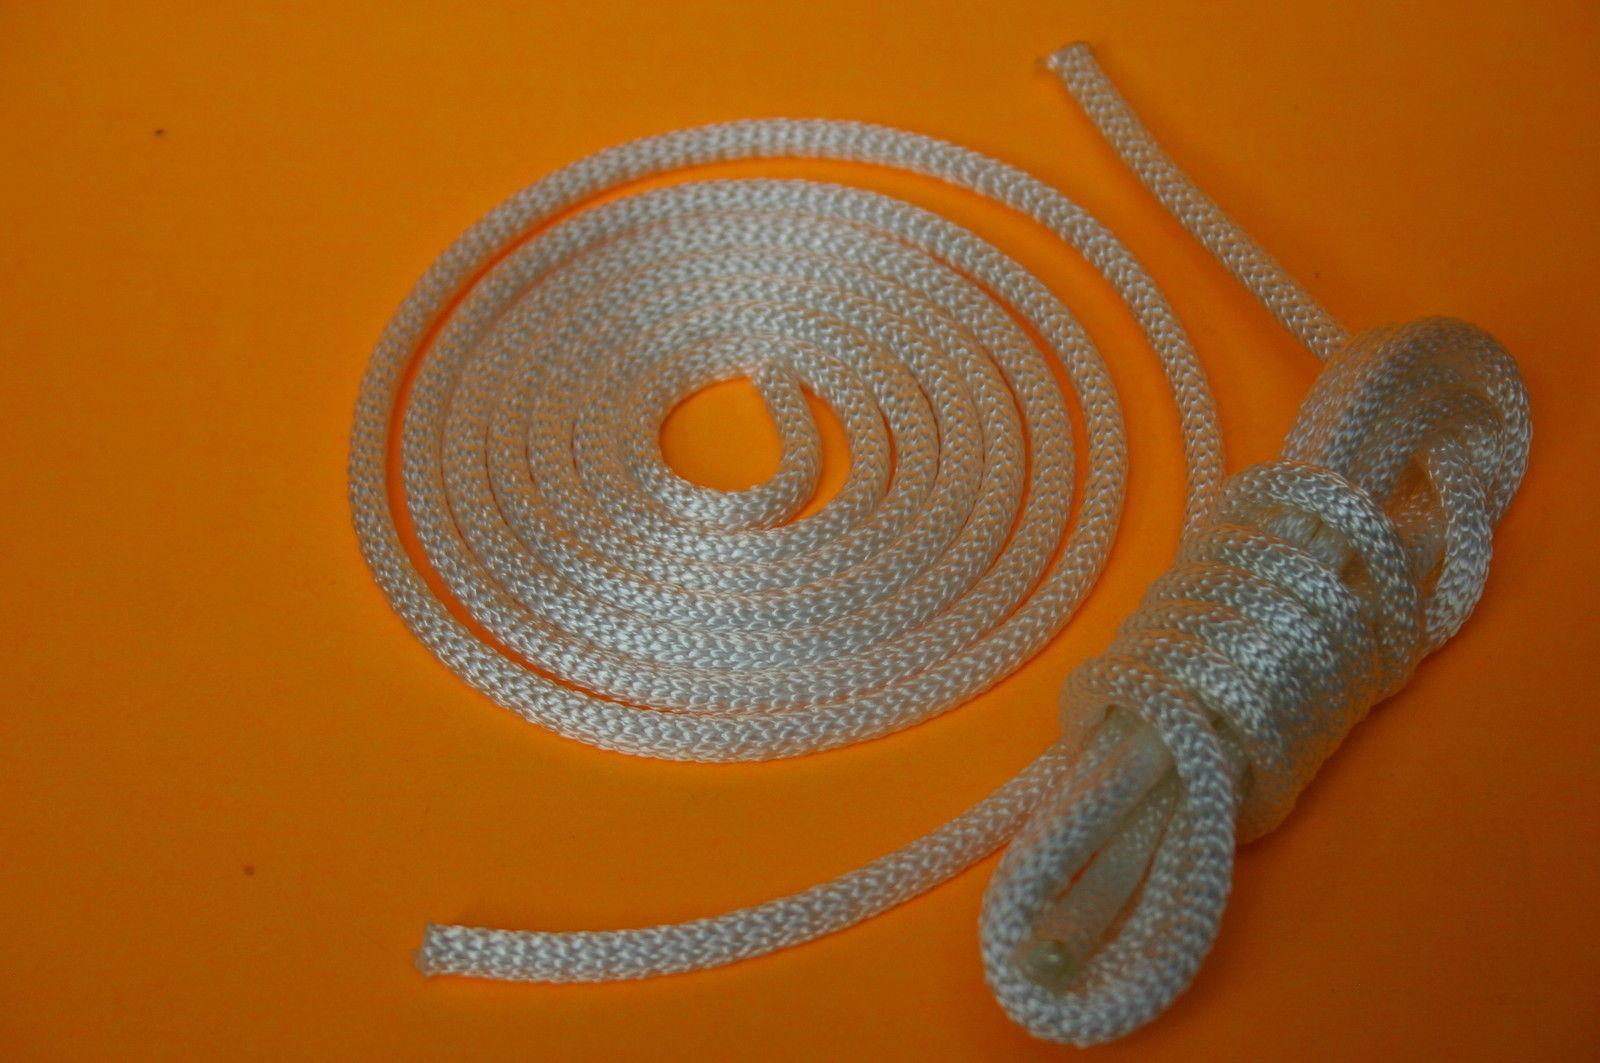 KAWASAKI 1989-2004 KLF300 Bayou 4x4 Pull Start Ropes Recoil Starter